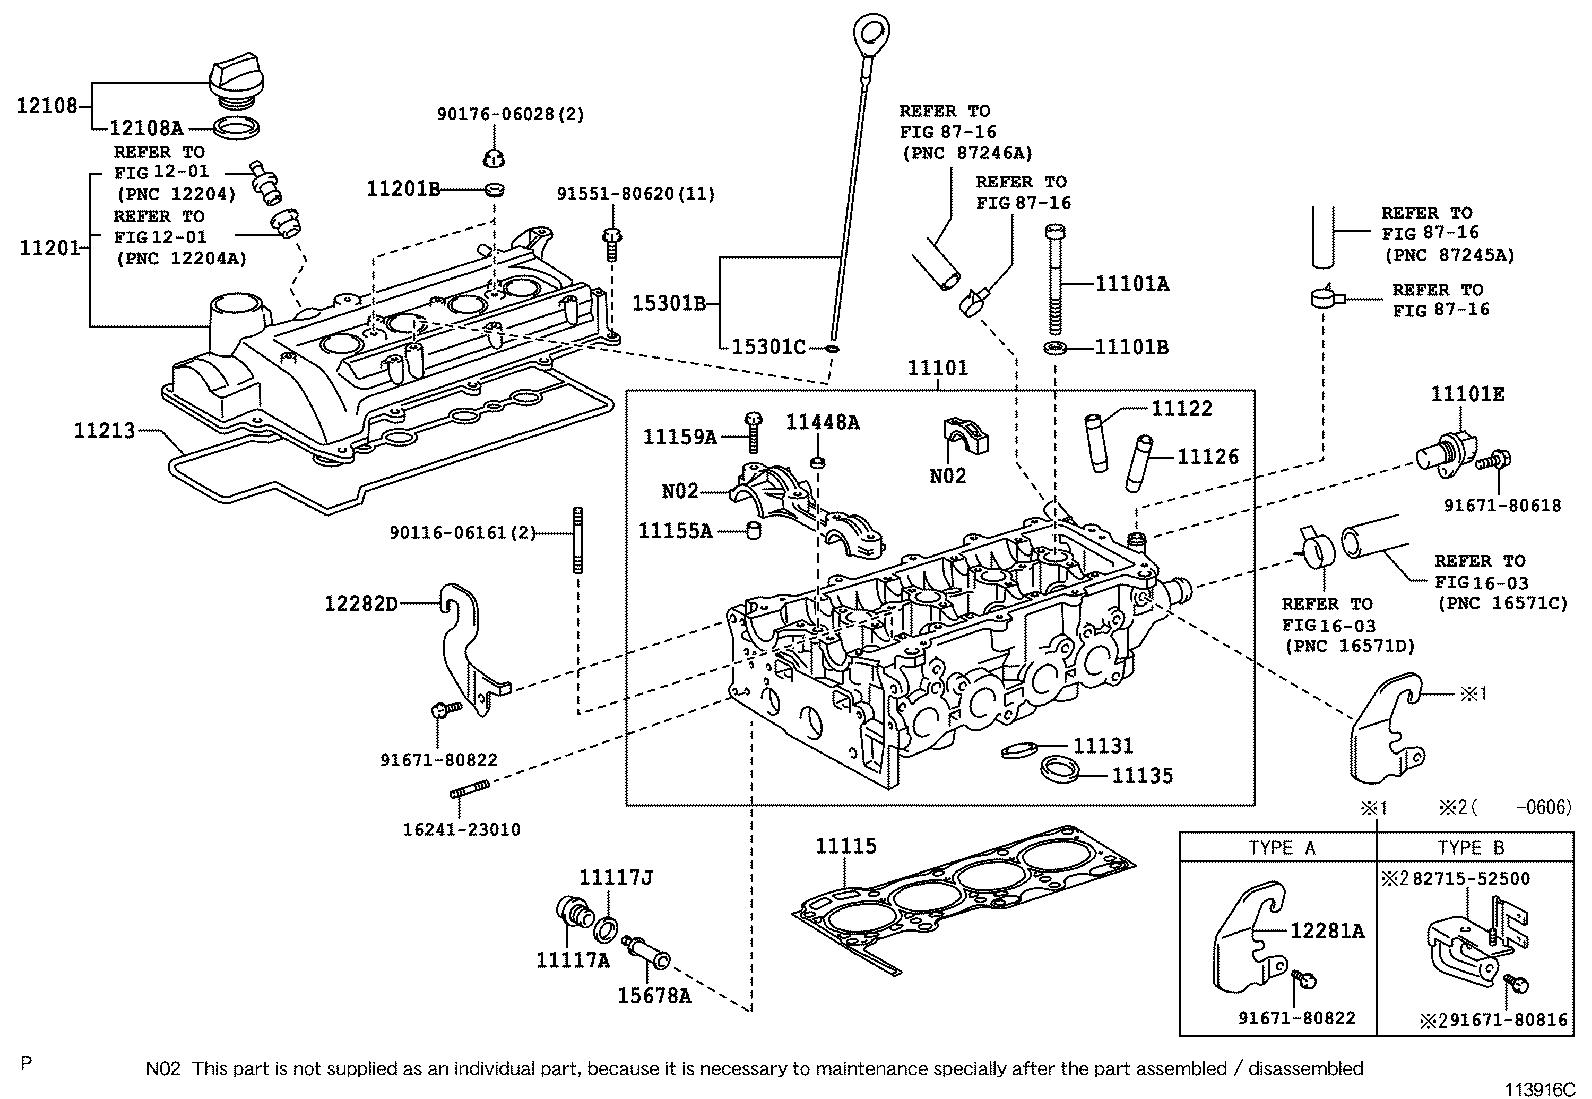 [DIAGRAM_5FD]  TOYOTA YARIS FRPSCP90L-CGMGKW - TOOL-ENGINE-FUEL - CYLINDER HEAD | Japan  Parts EU | 2007 Toyota Yaris Engine Diagram |  | Japan Parts EU